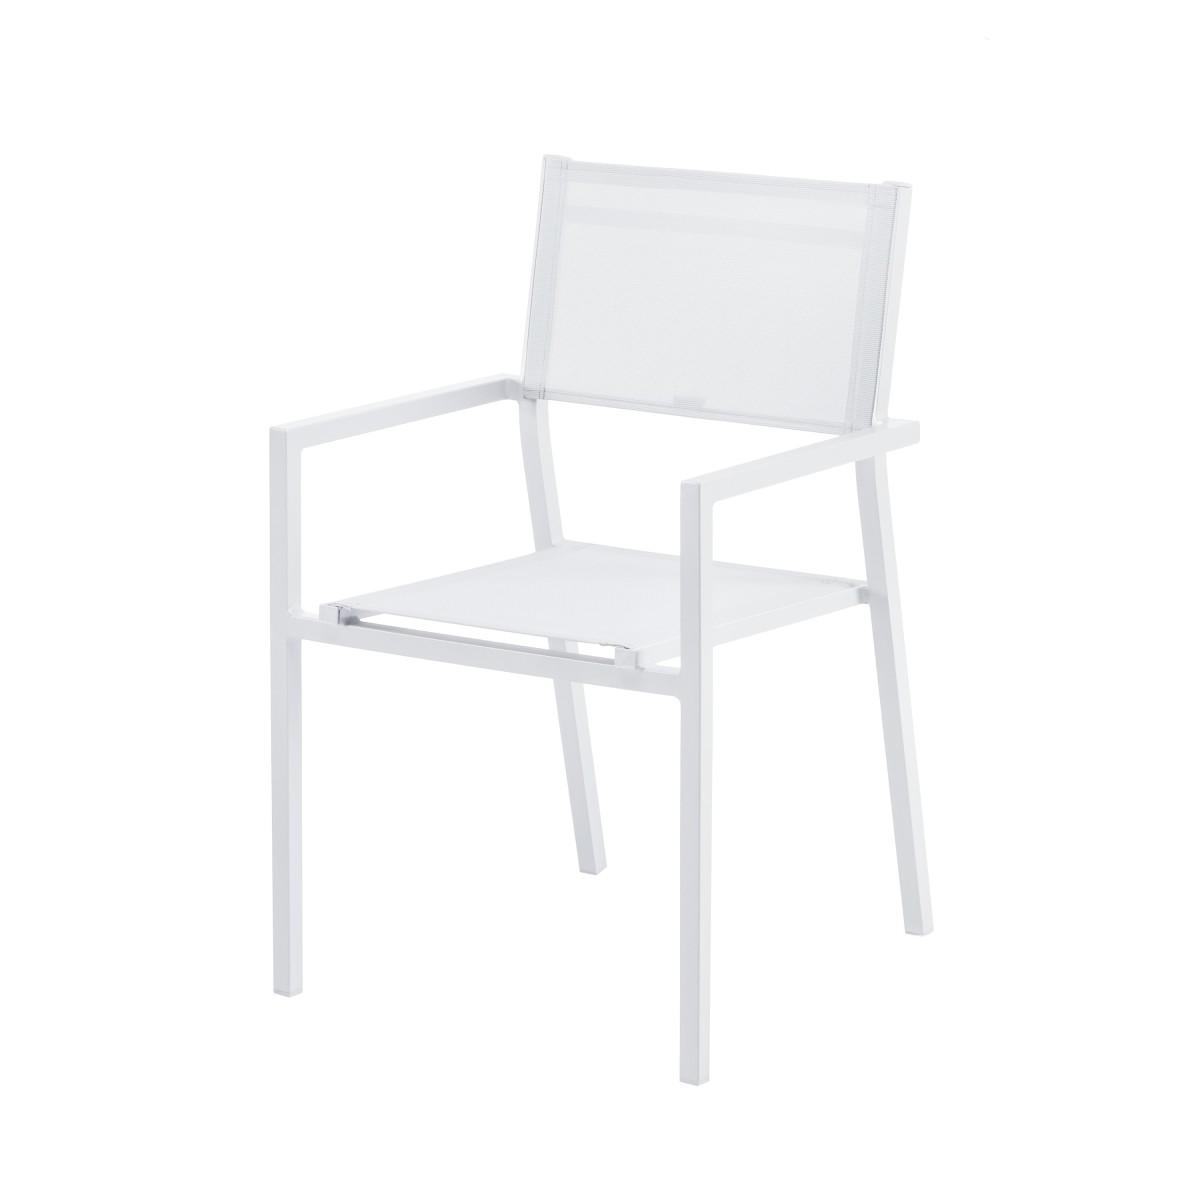 Кресло Naterial Orion Alfa цвет светло-серый